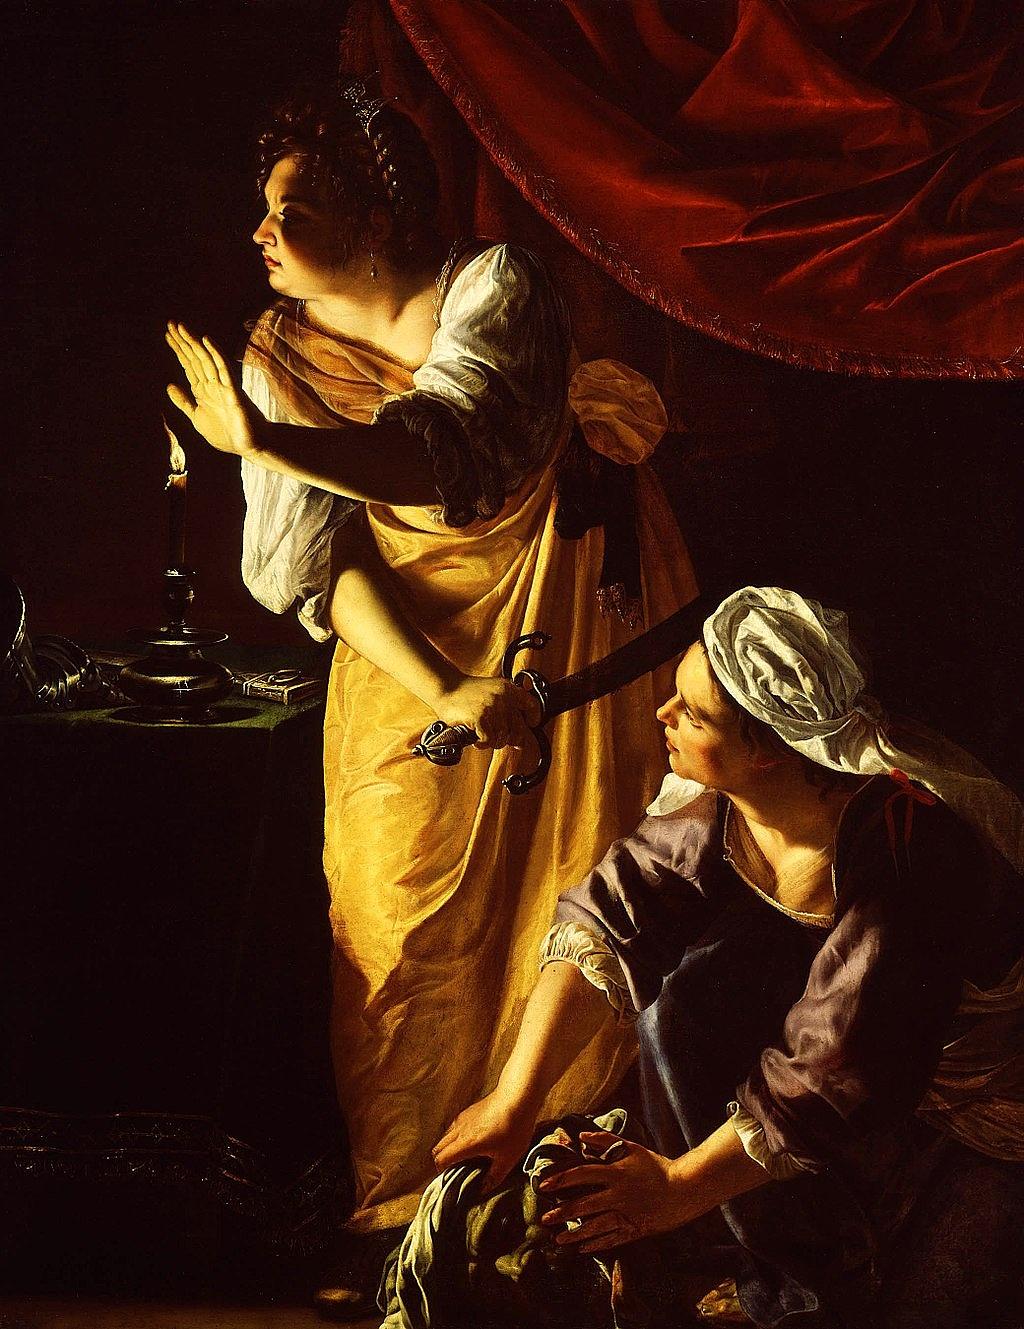 1024px-Artemisia_Gentileschi_Judith_Maidservant_DIA-152324.jpg